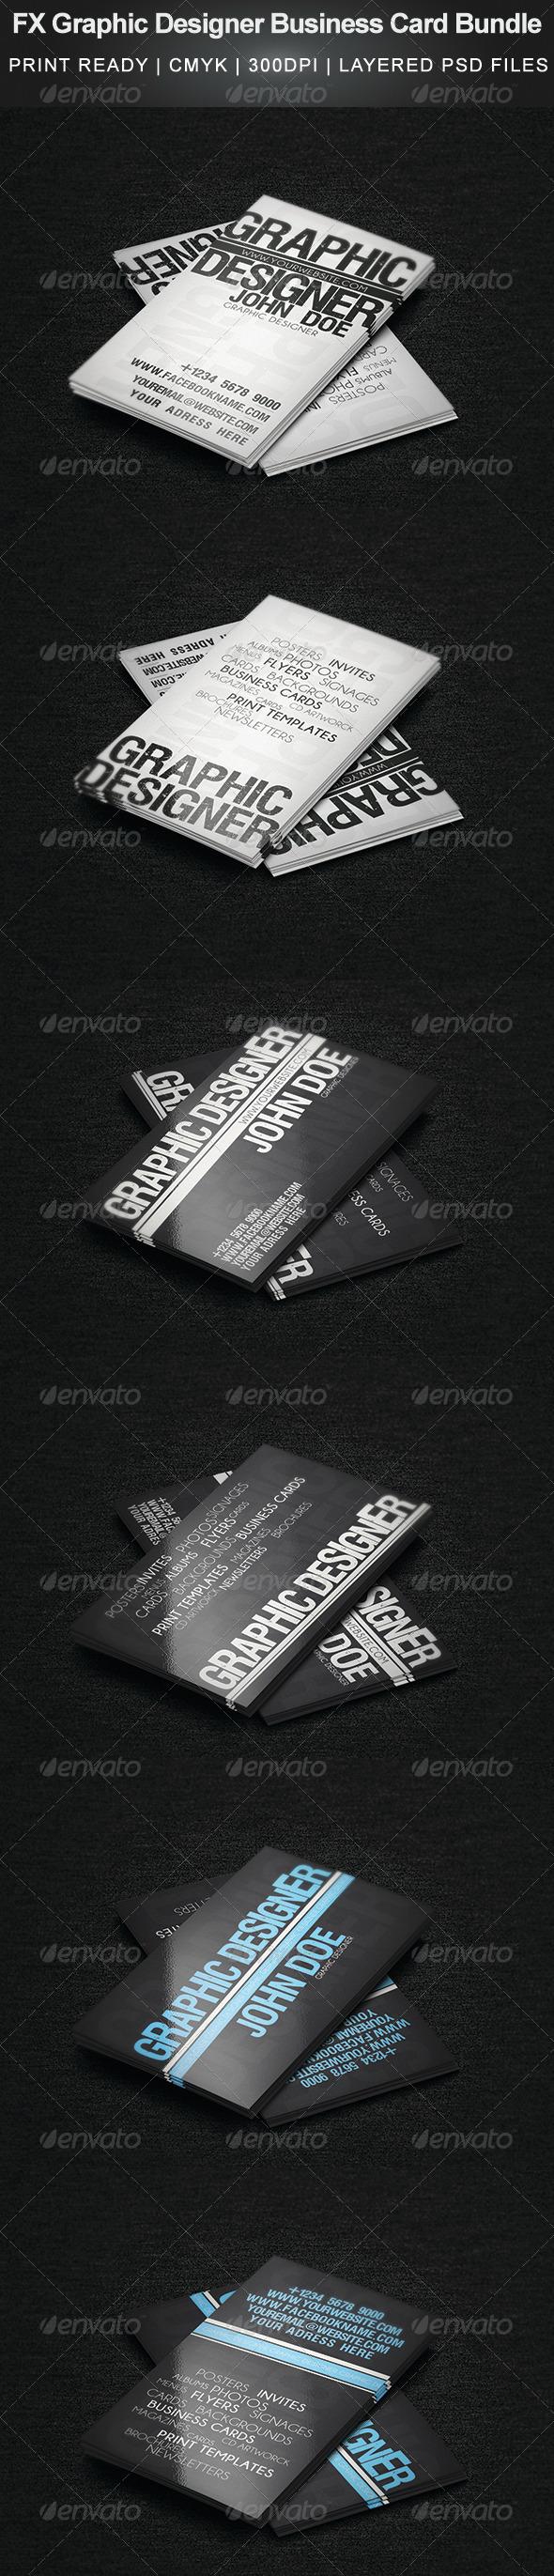 GraphicRiver FX Graphic Designer Business Card Bundle 5033606